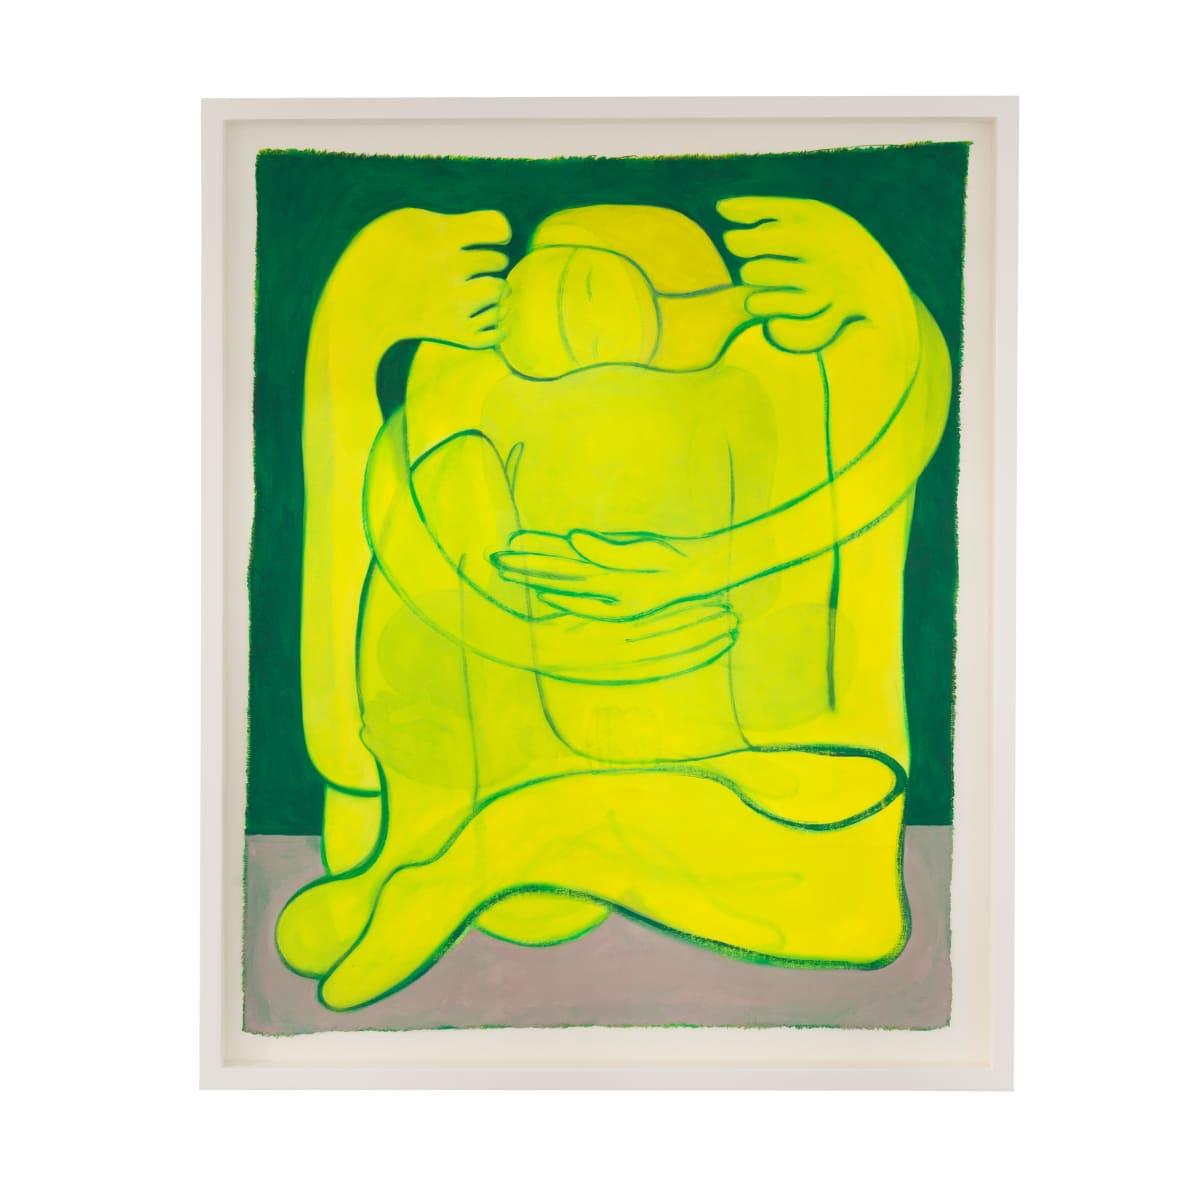 Tahnee Lonsdale Mrs, 2018 - 2019 oil on canvas 100 x 81 cm